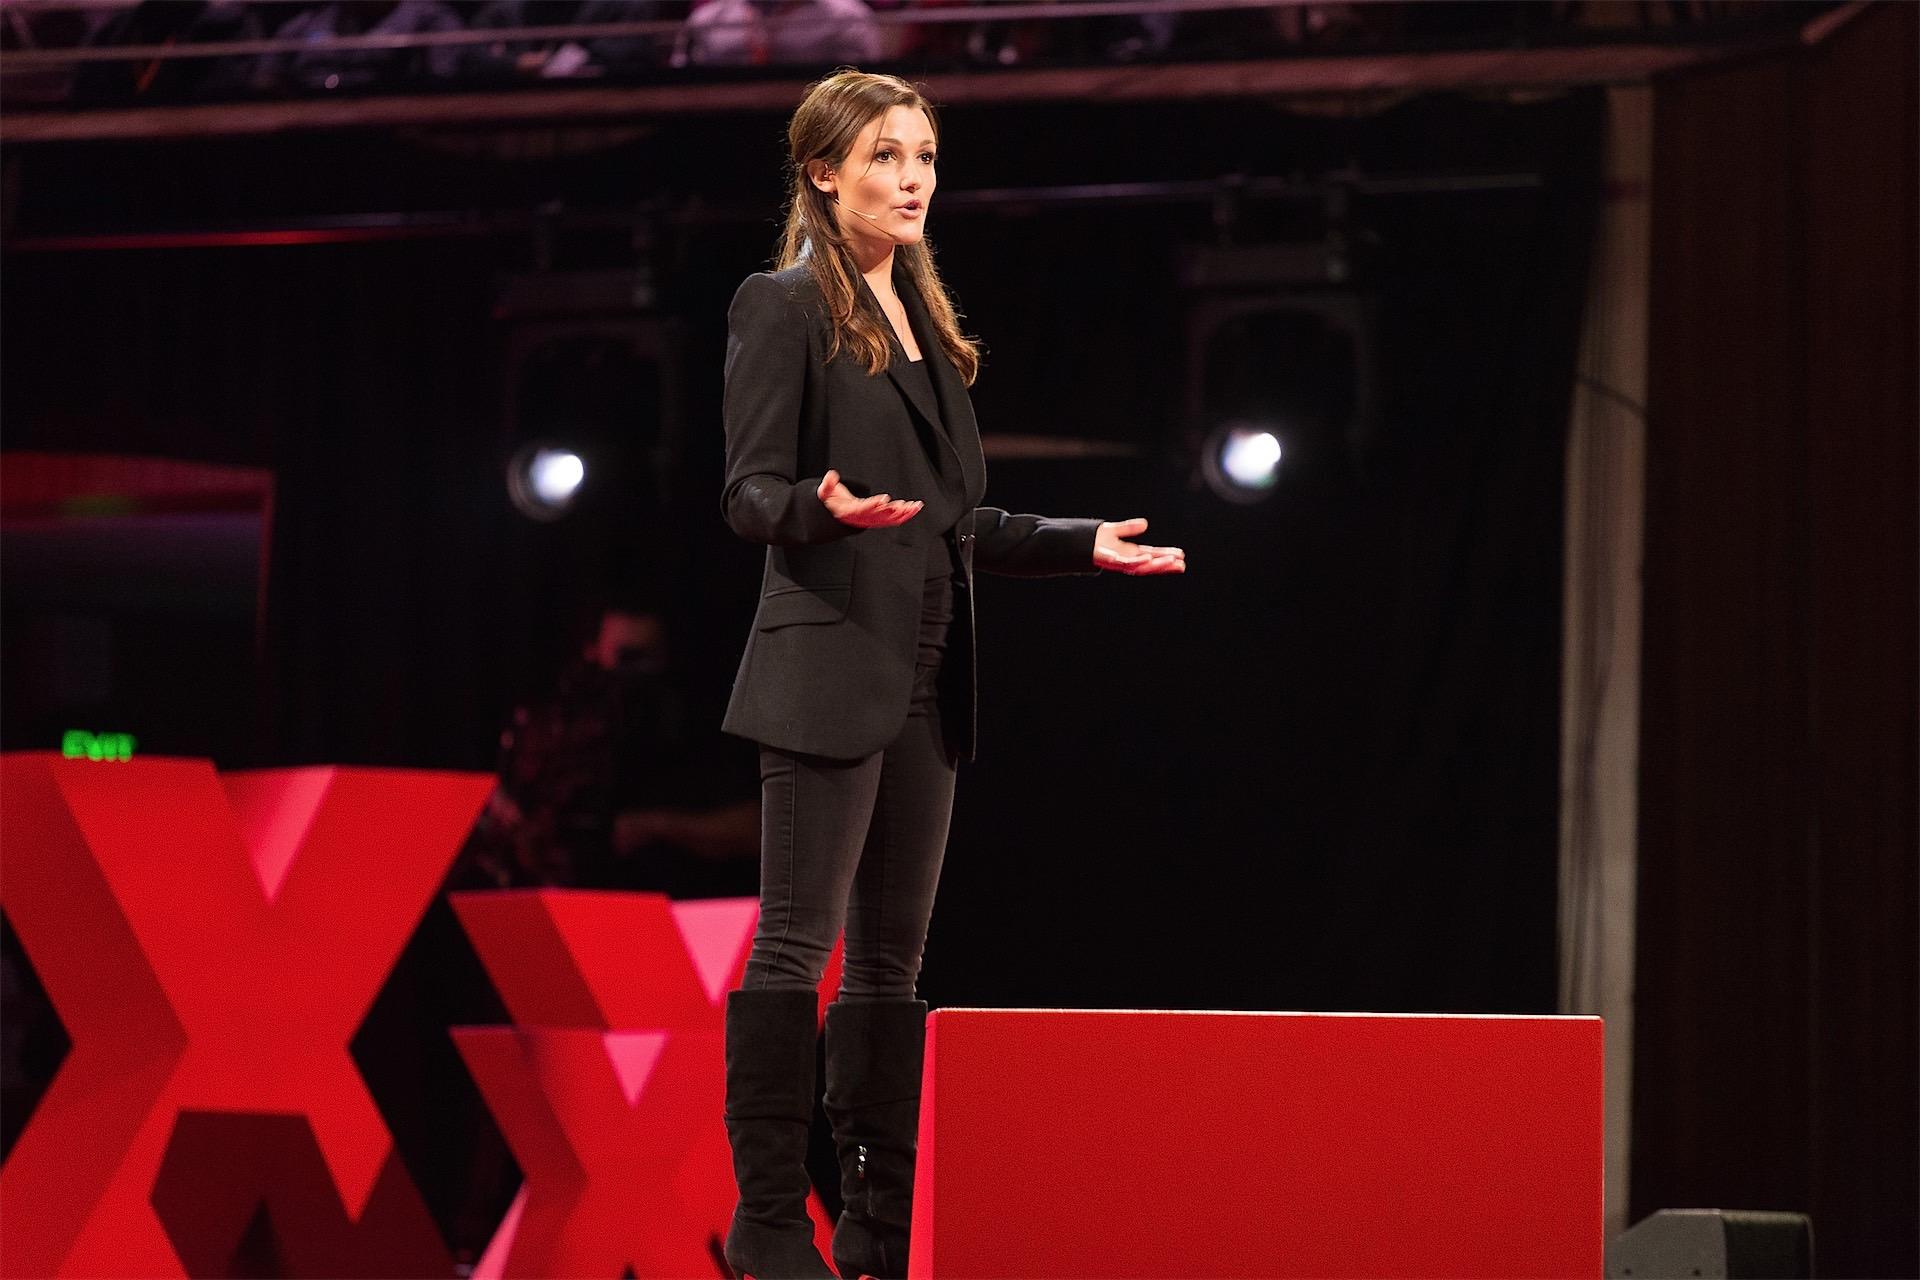 Photo: Gary Compton | TEDxSydney